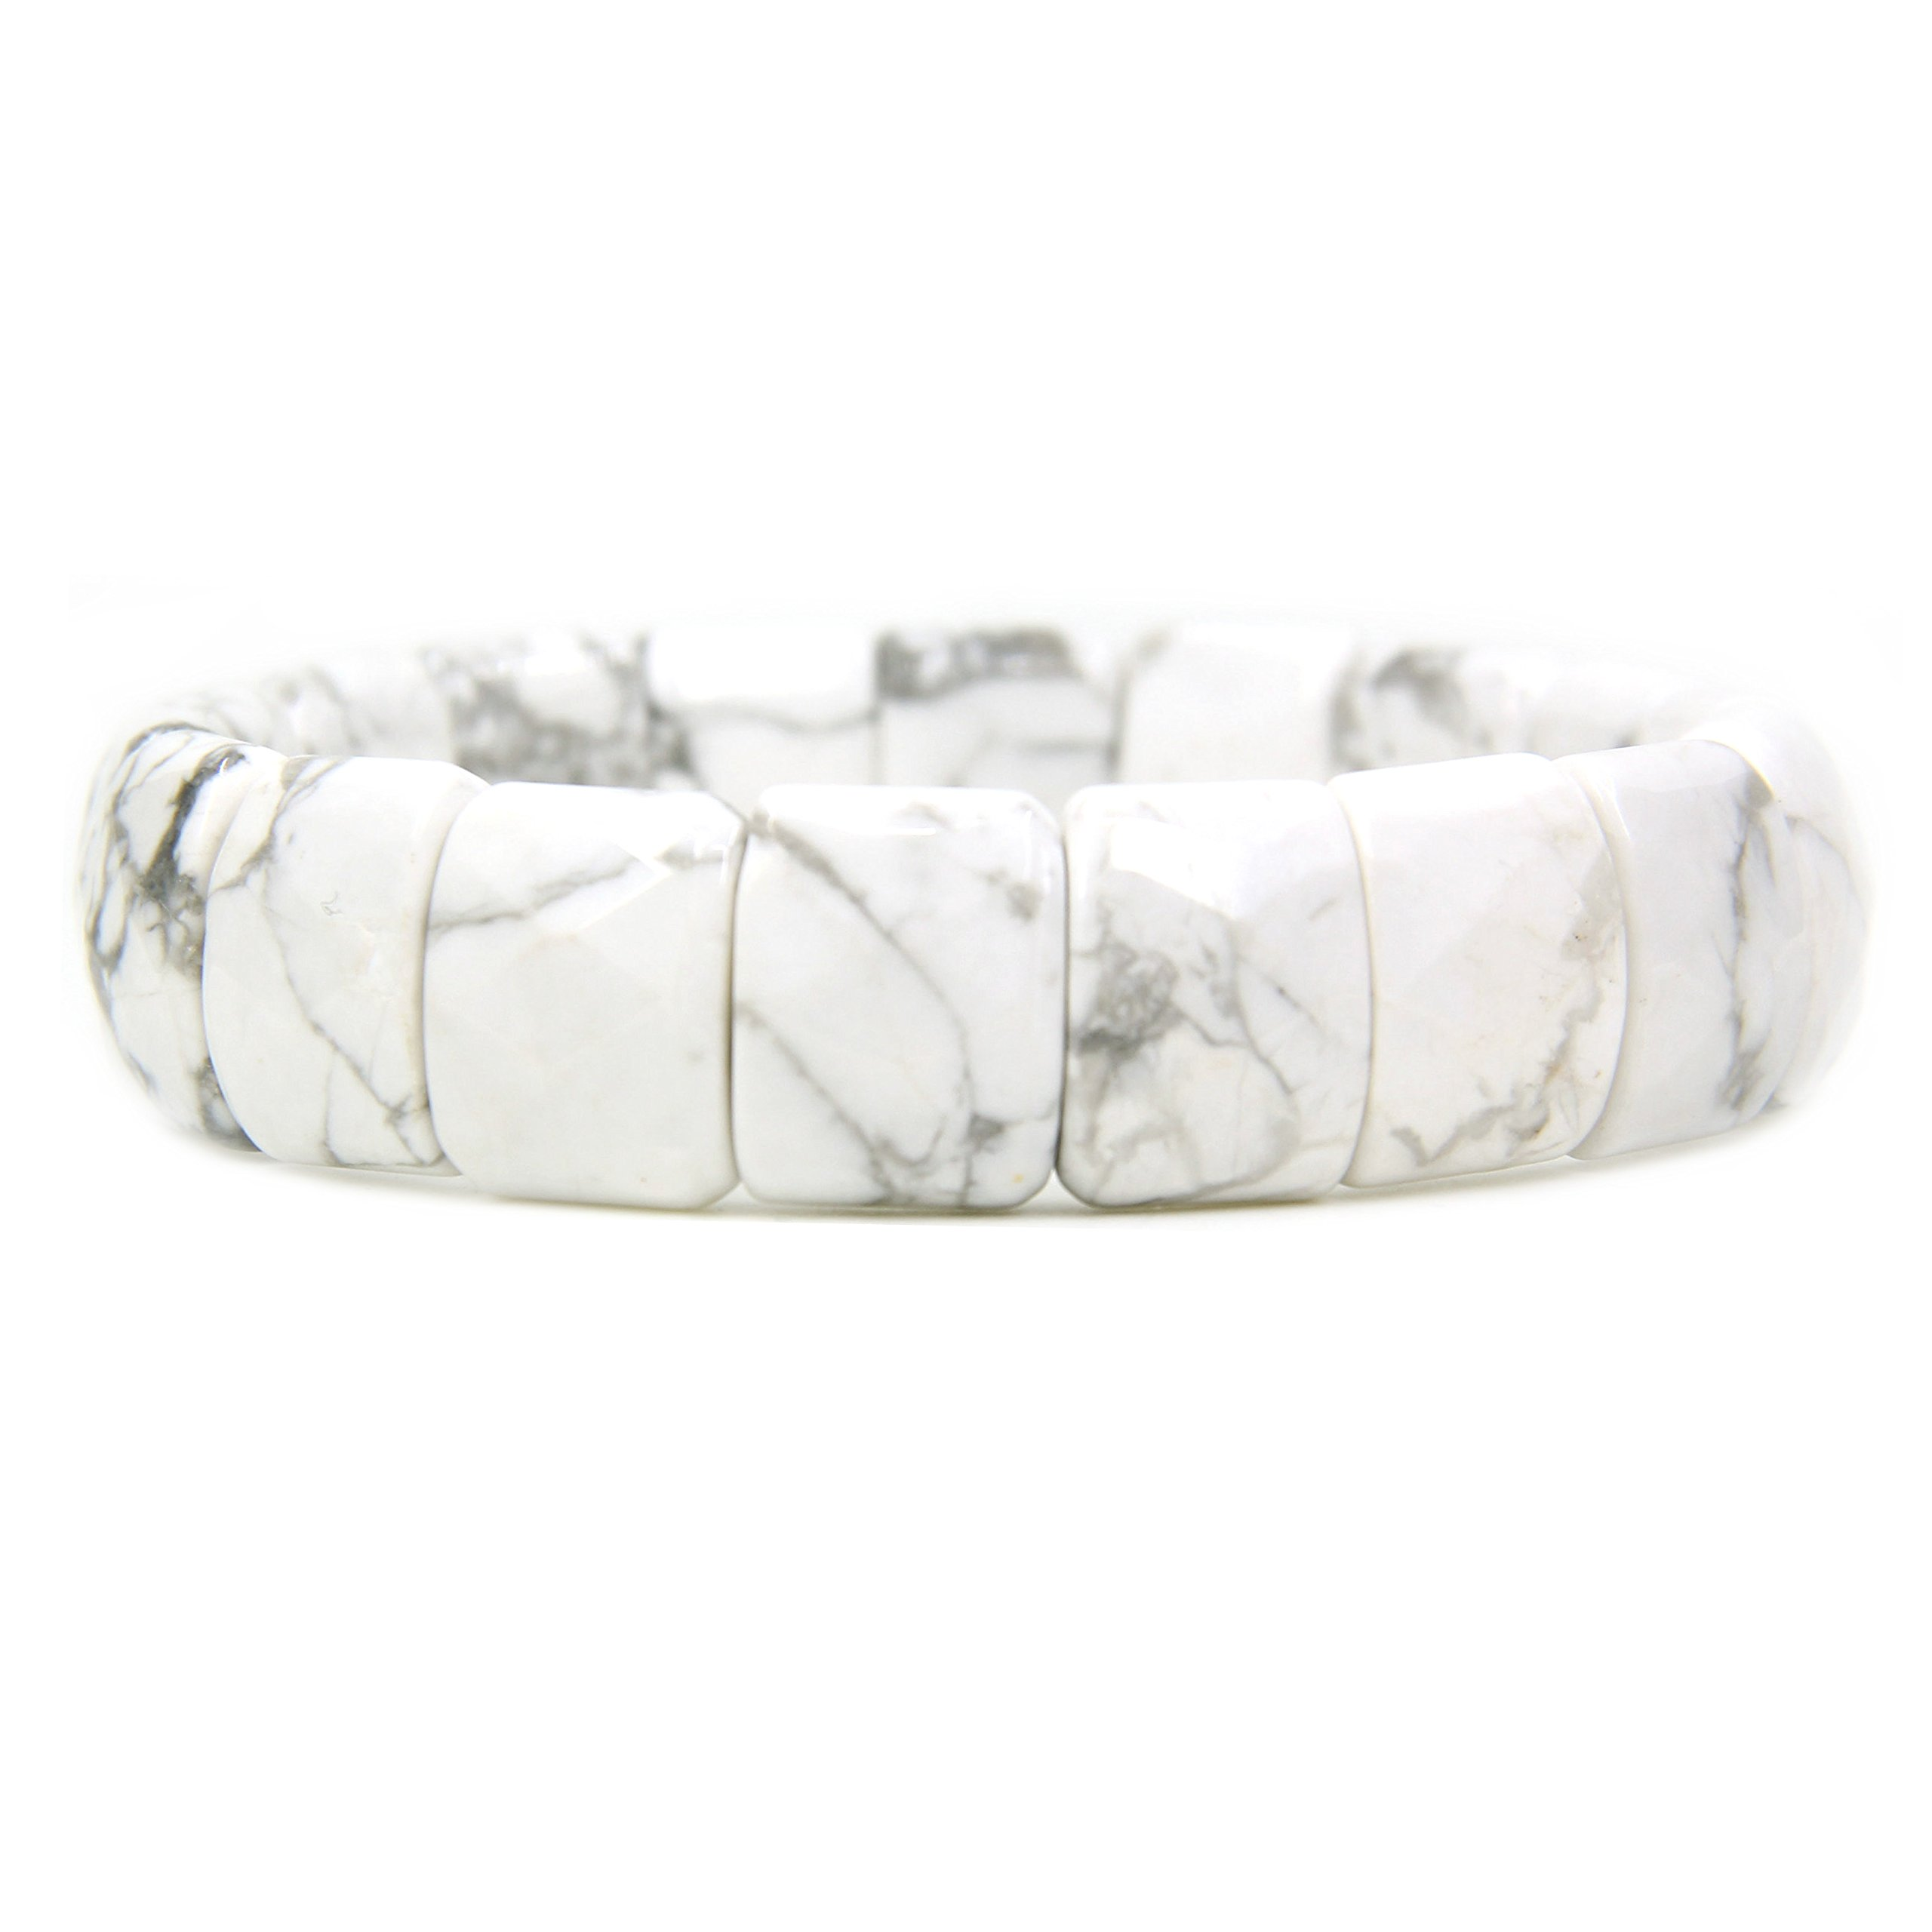 Amandastone Natural White Howlite Gemstone 15mm Square Grain Faceted Beaded Stretchable Bracelet 7'' Unisex